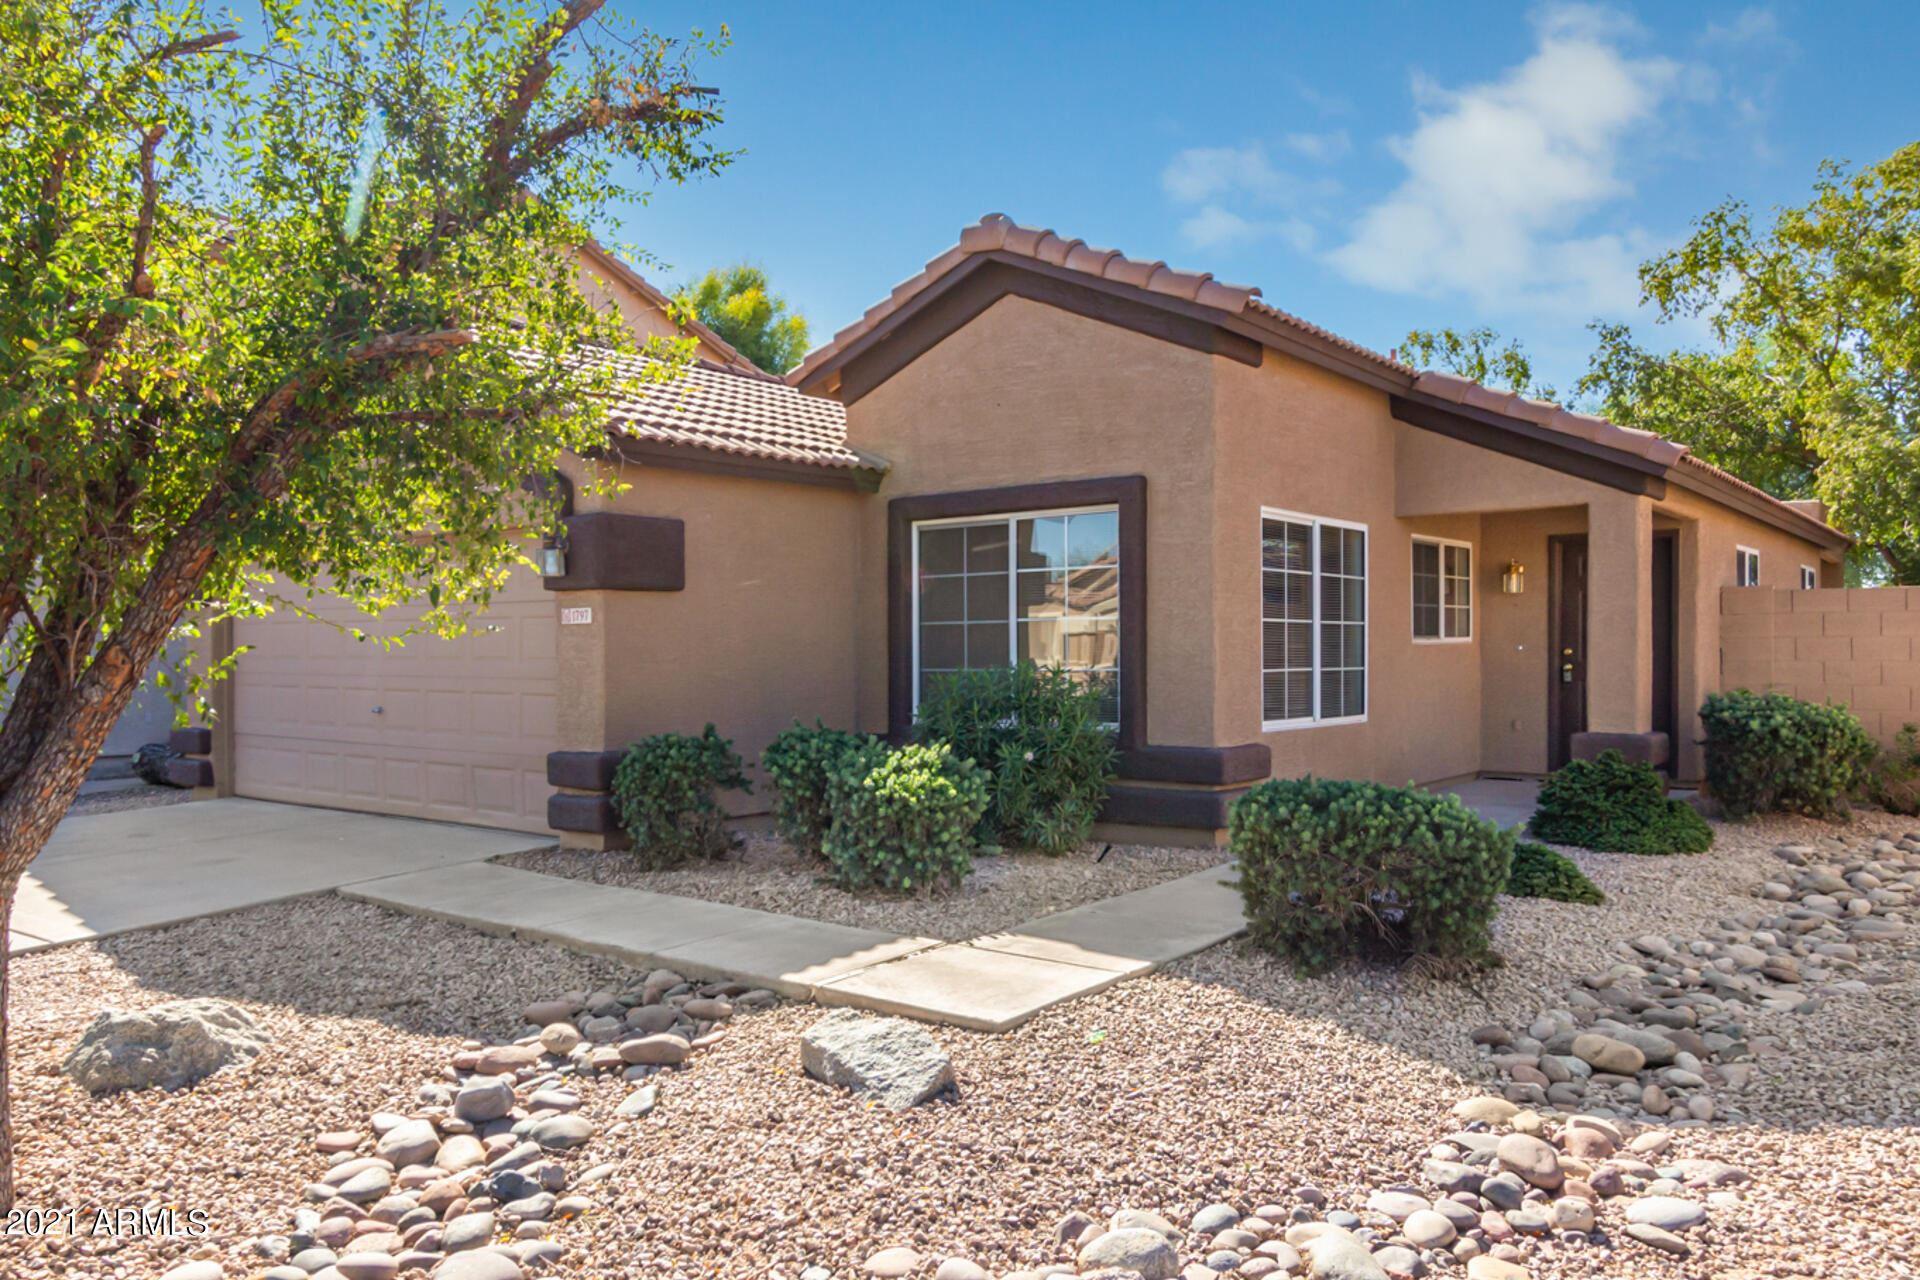 Photo of 1797 E CARLA VISTA Drive, Chandler, AZ 85225 (MLS # 6307109)